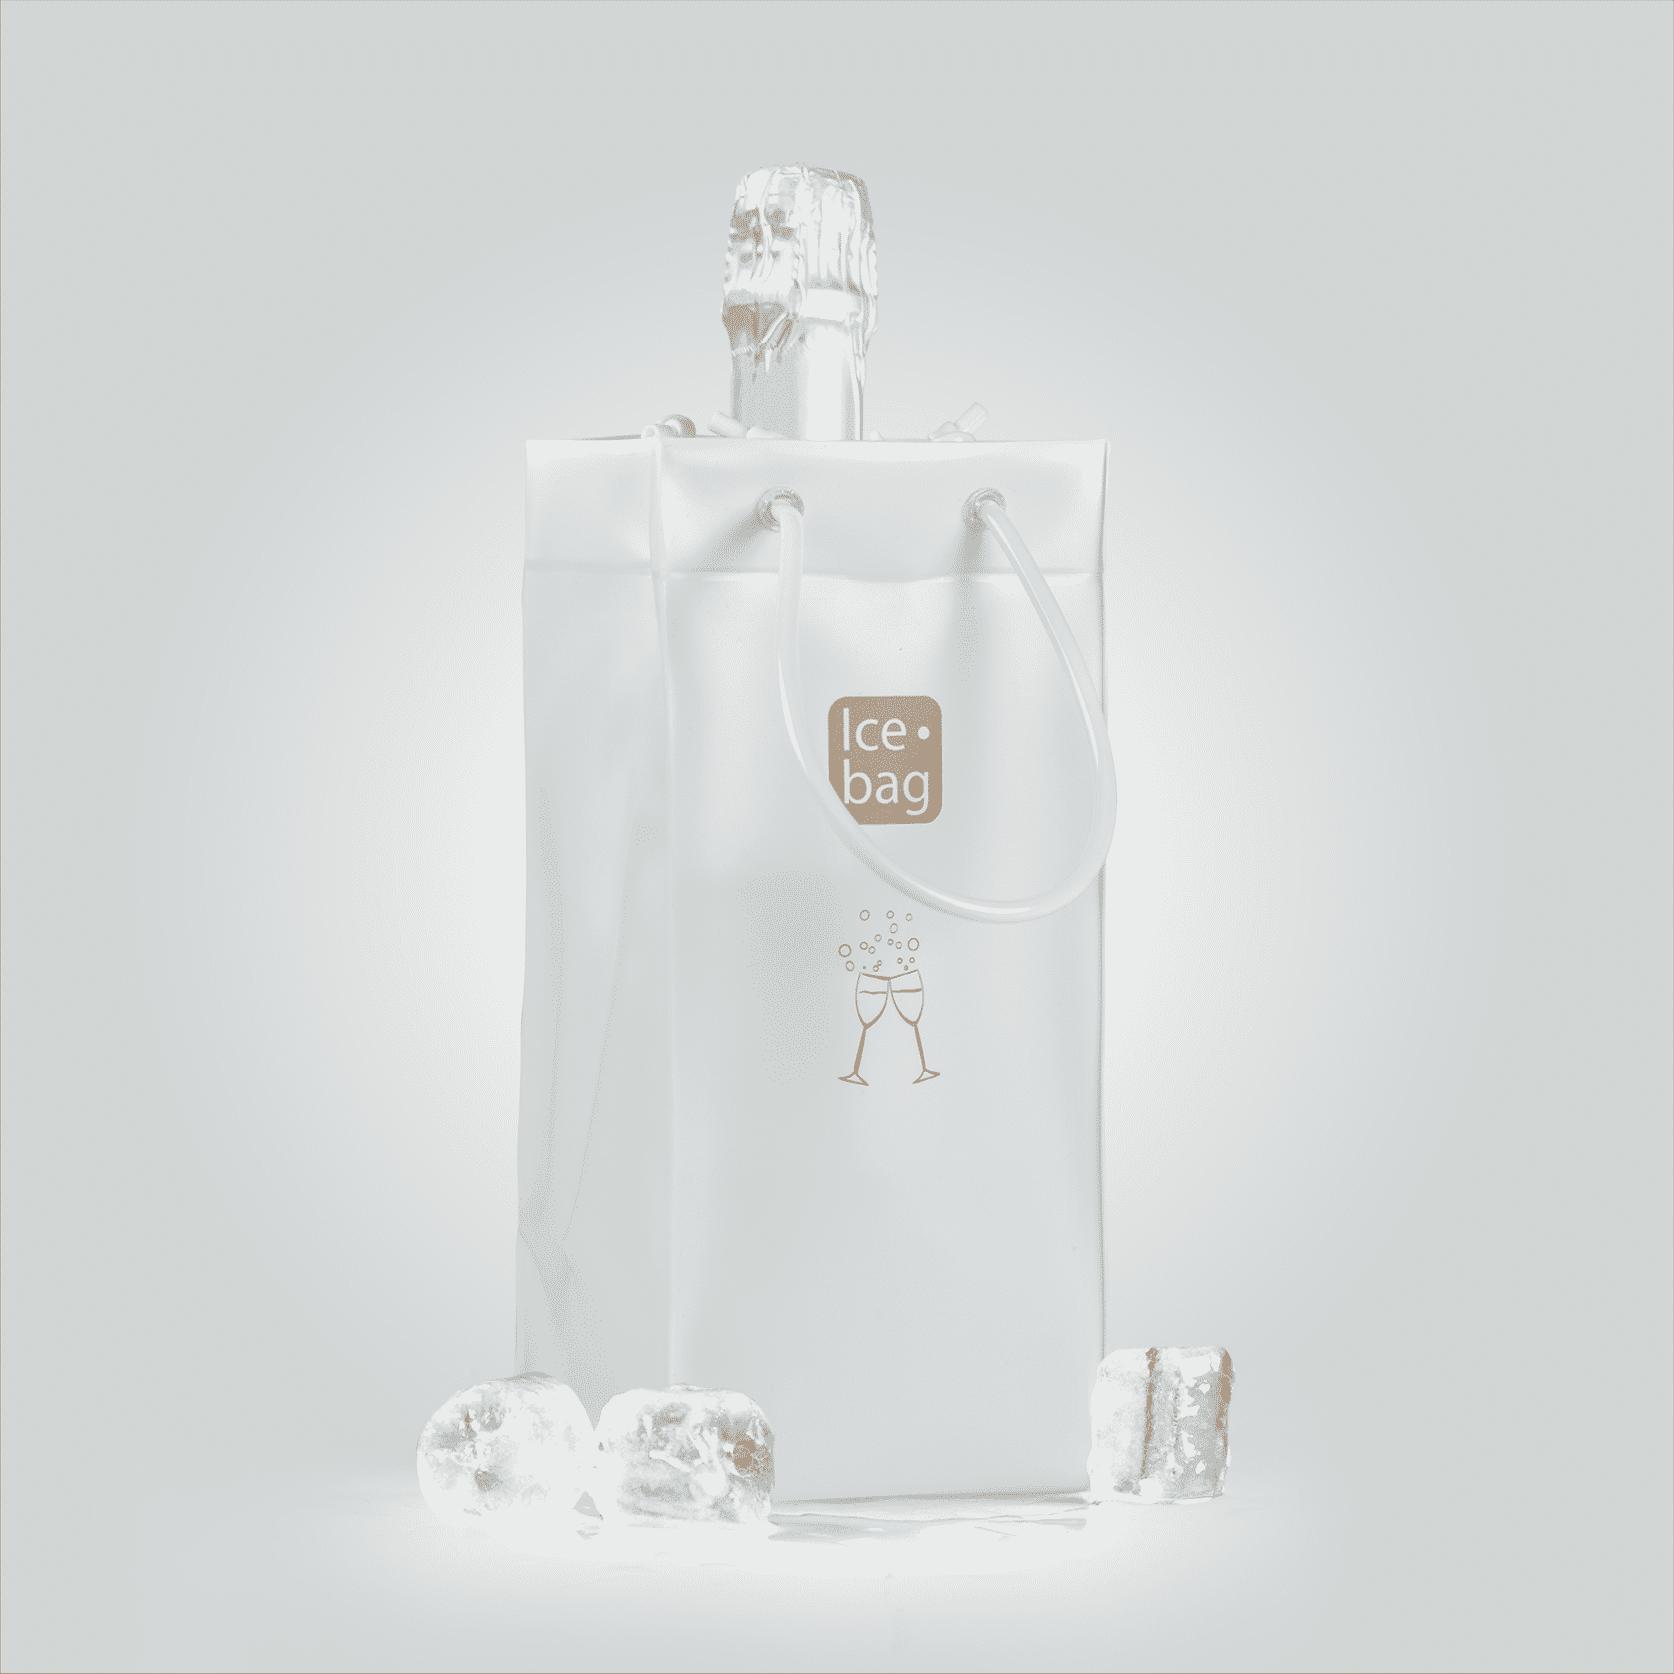 Sac à glaçon Ice.bag blanc